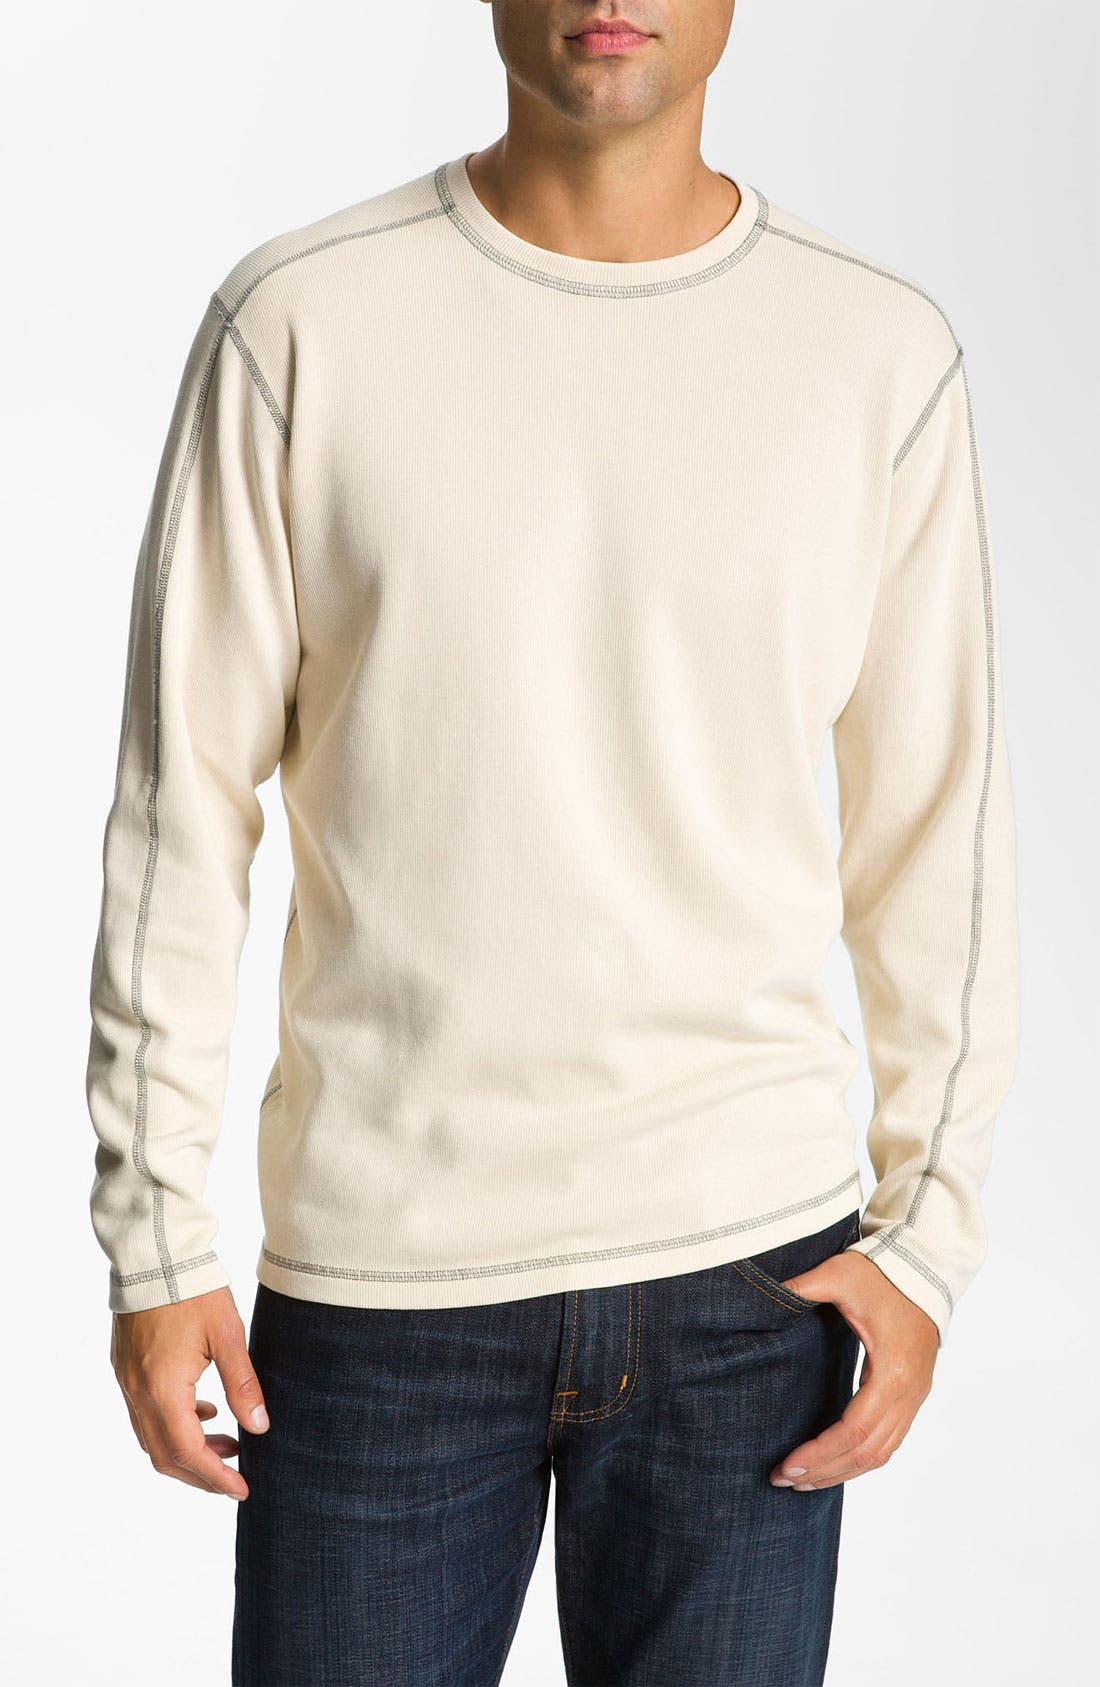 Main Image - Agave 'High Camp' Long Sleeve T-Shirt